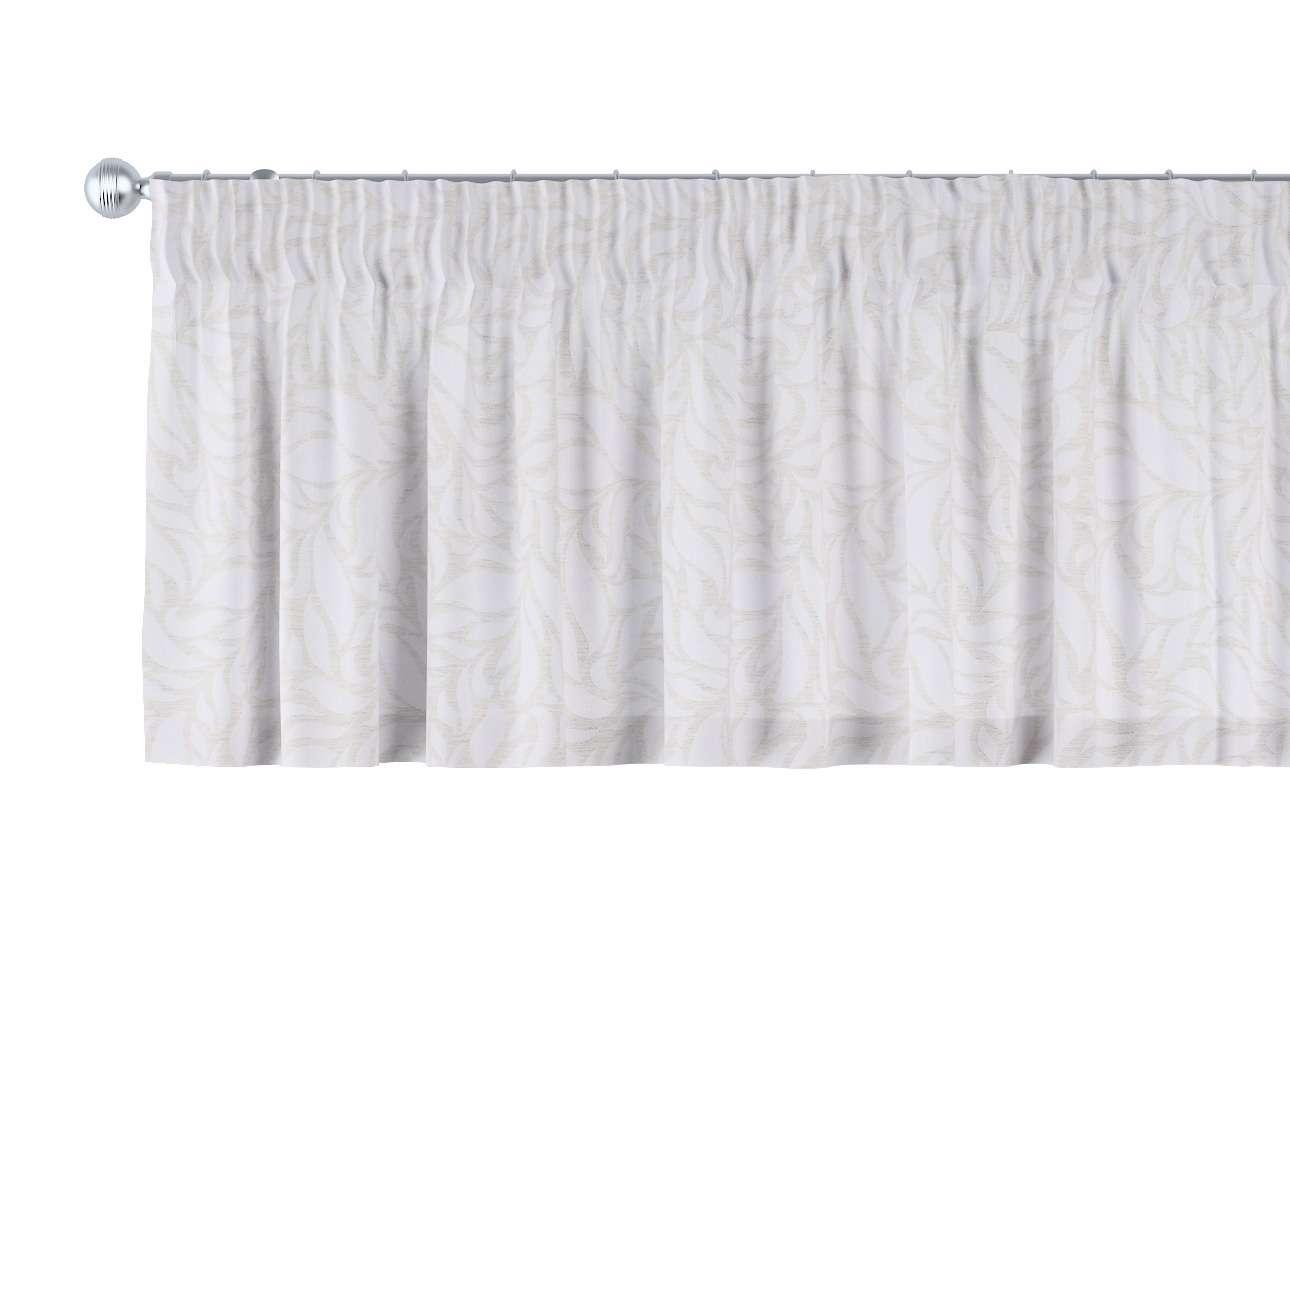 Gardinkappa med rynkband 130 x 40 cm i kollektionen Venice - NYHET, Tyg: 140-50